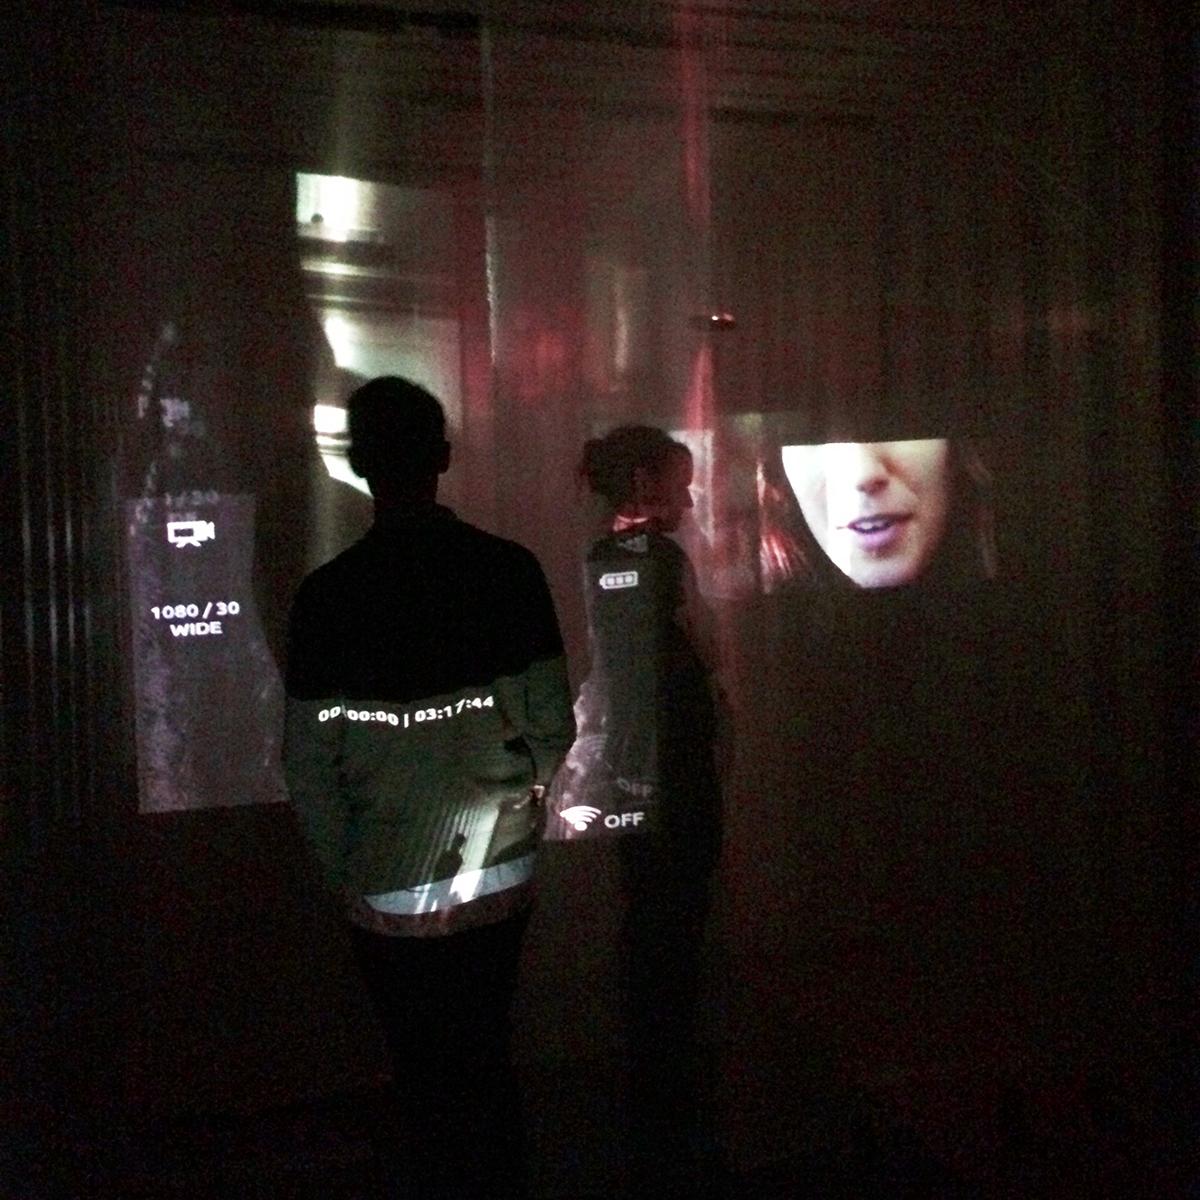 Francesi-Brooke_2014-Fall-CCA-Perceptual-Shifts_Installation-Photo-02.jpg